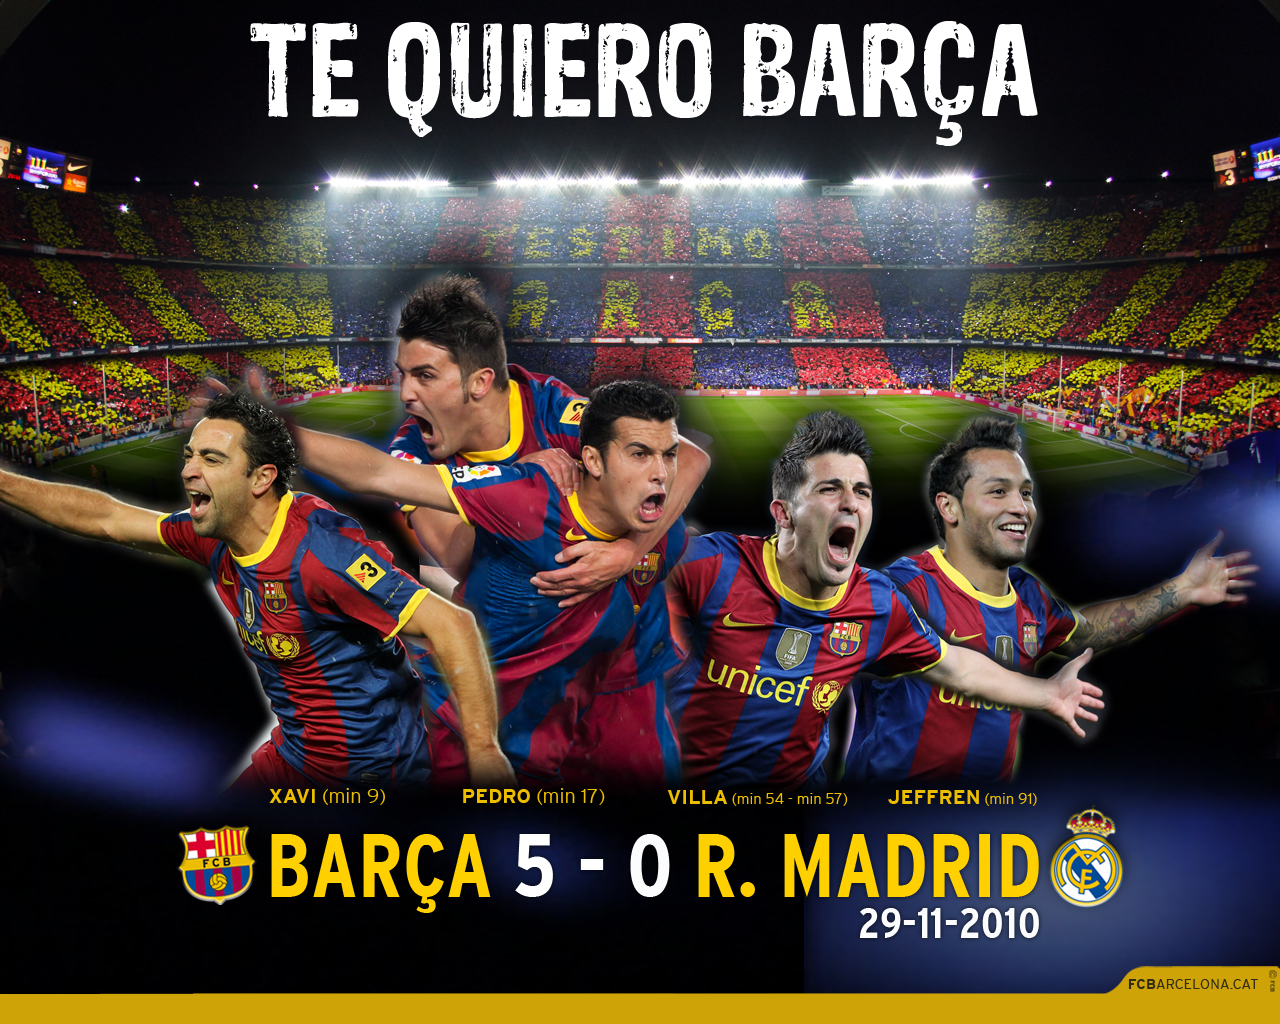 Image Result For En Vivo Barcelona Vs Real Madrid En Vivo En Vivo Online A